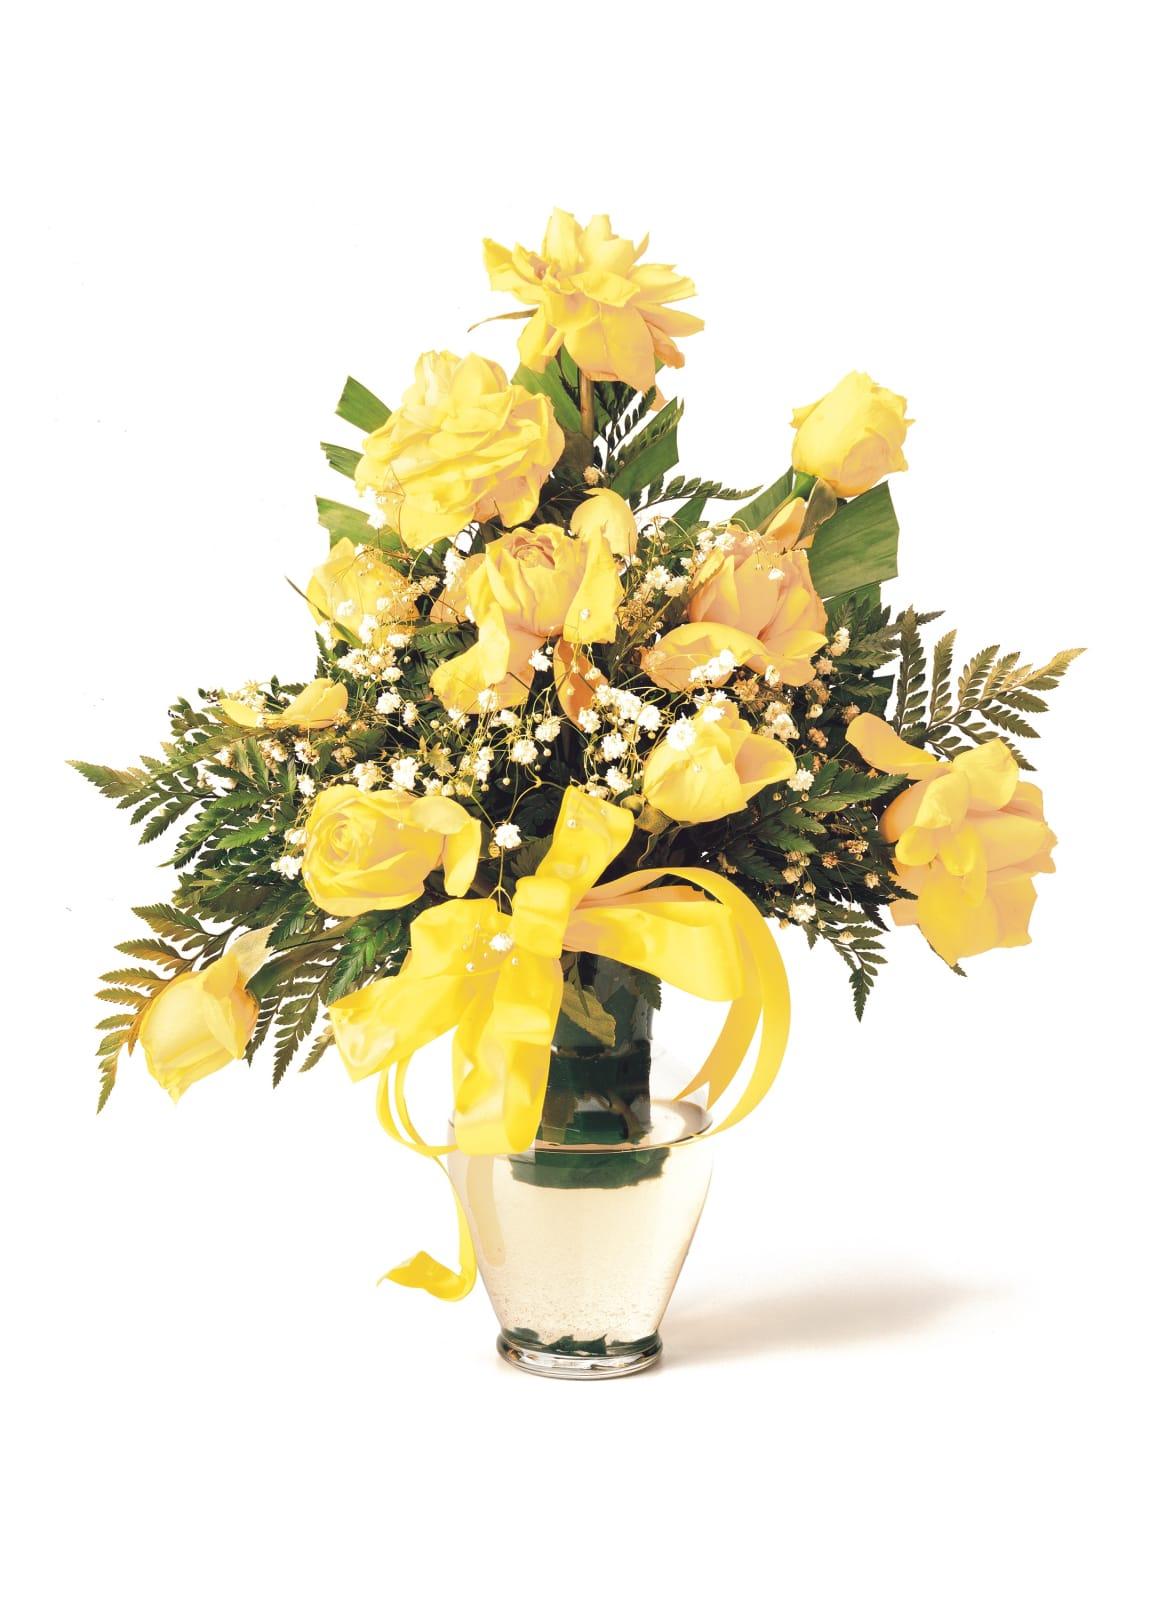 Chuck Ramirez, Quarantine Series: Yellow Roses, 2000